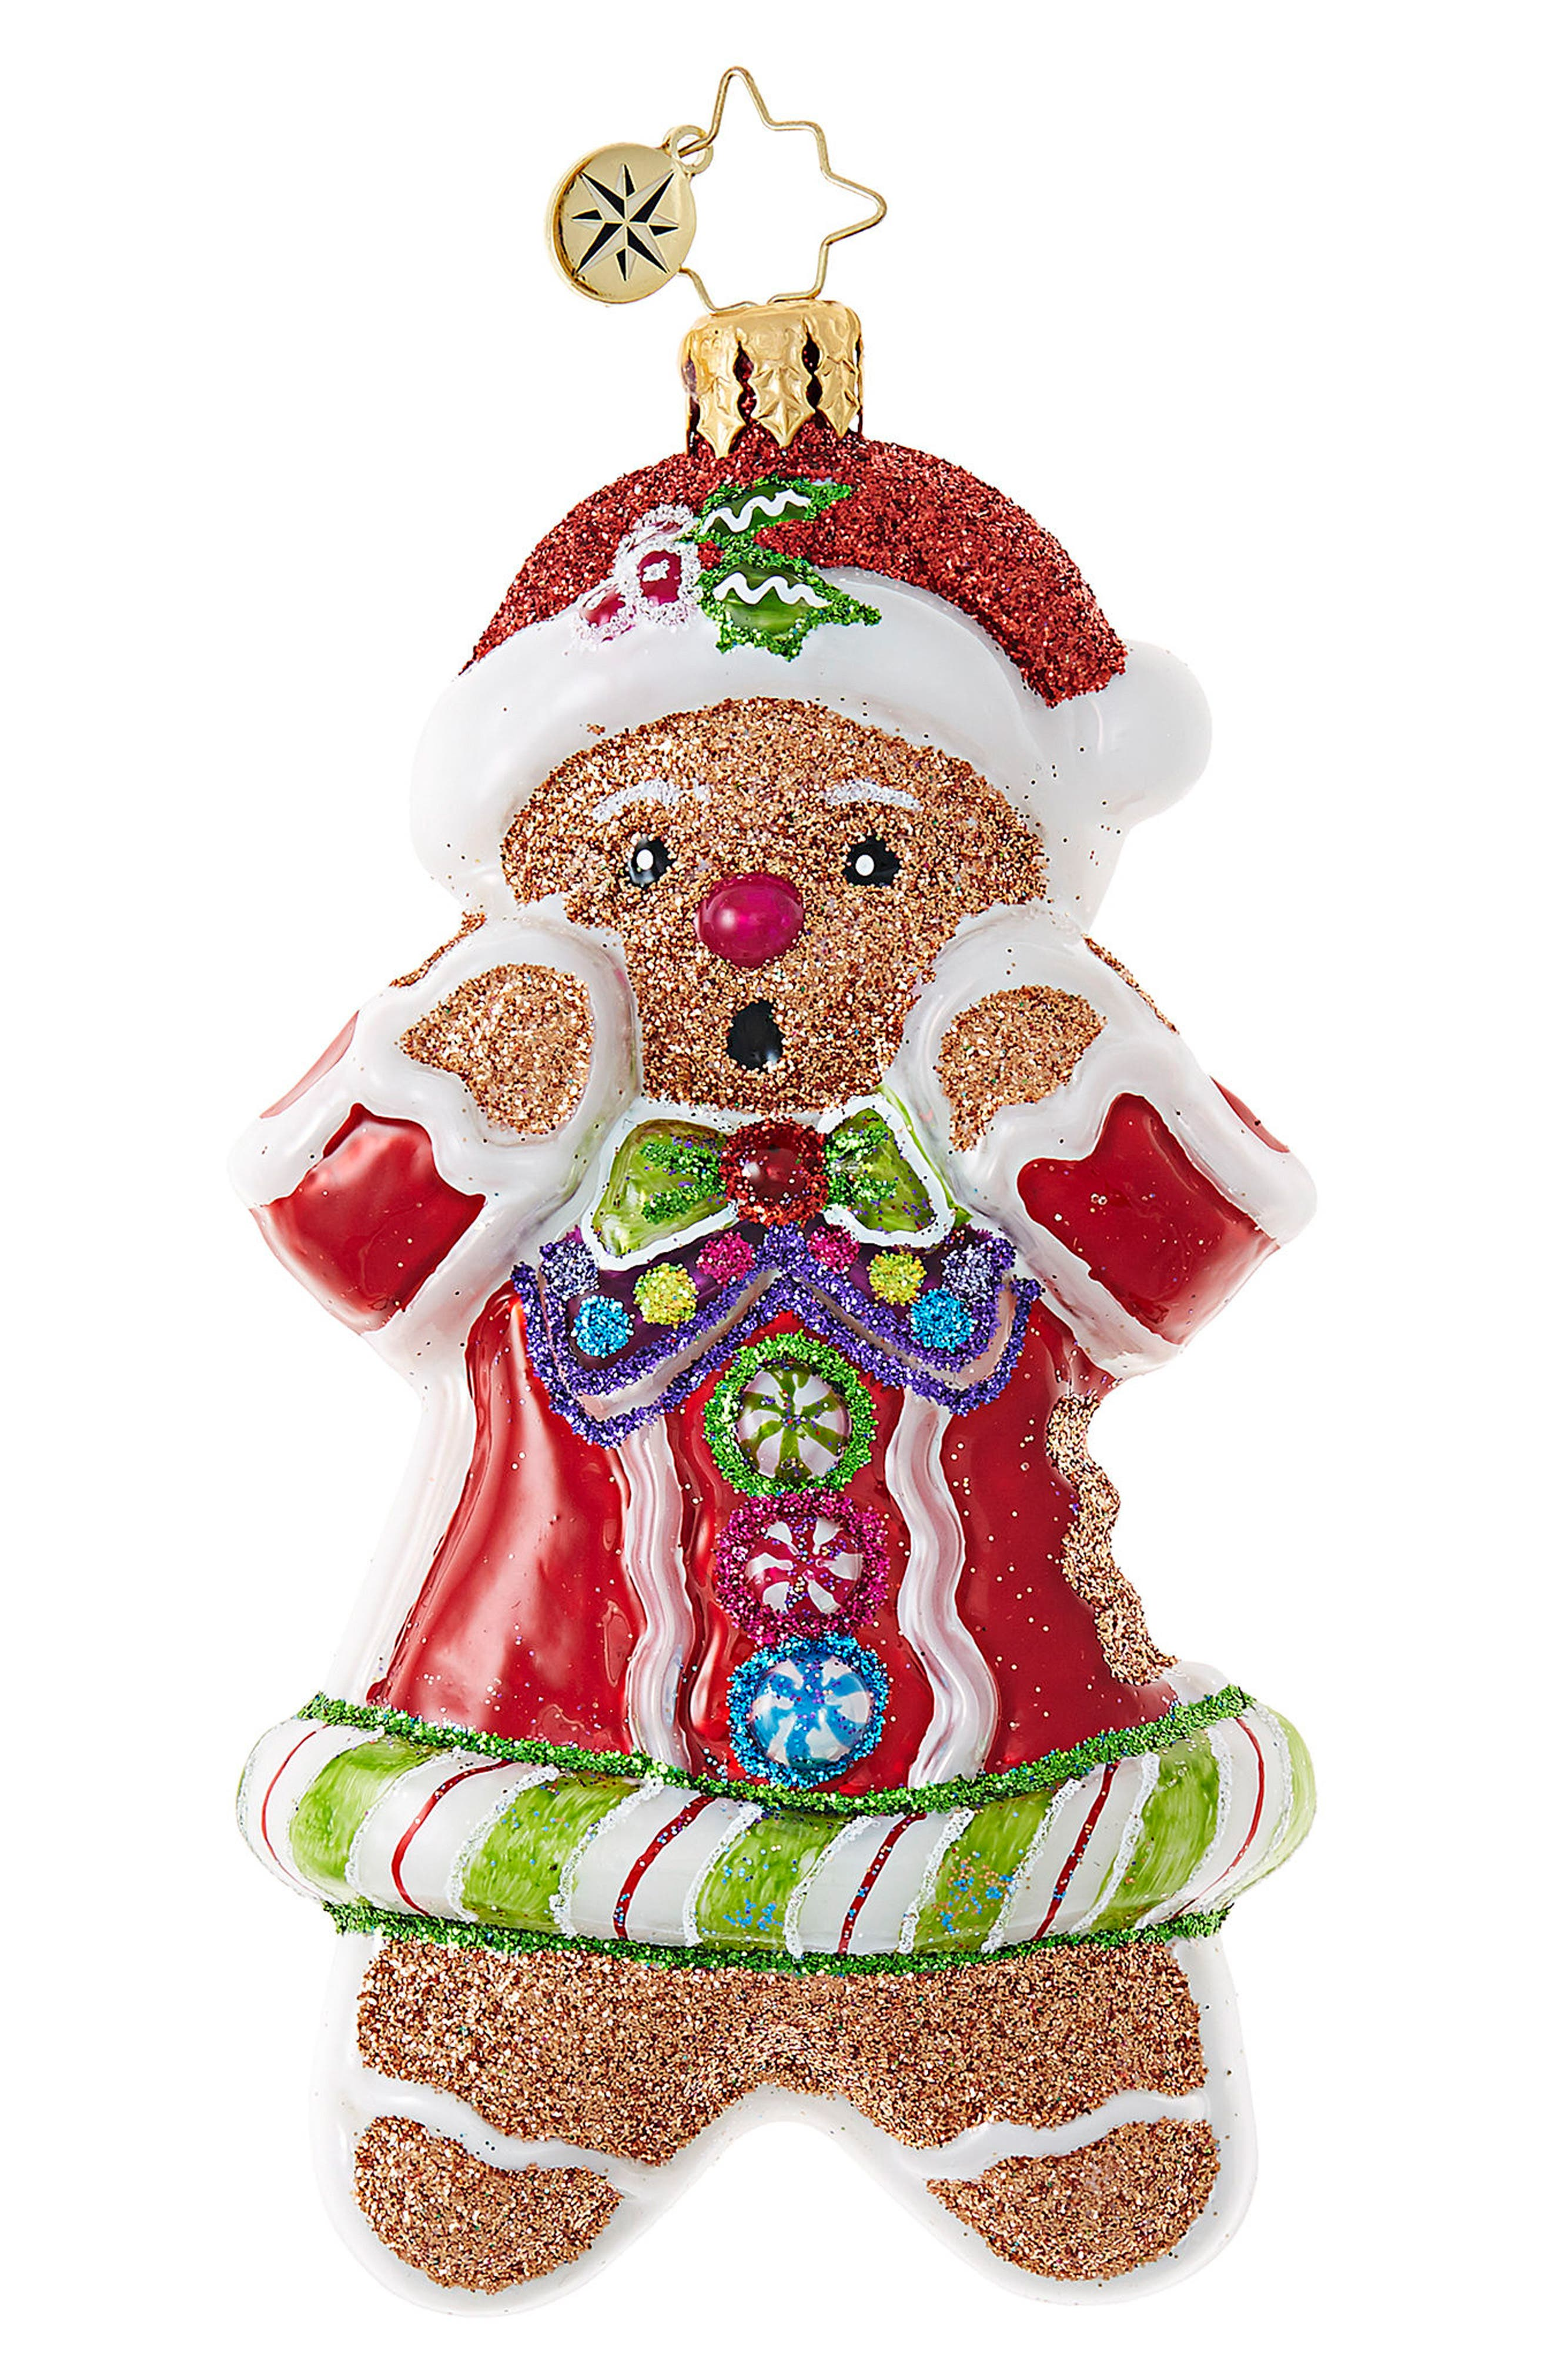 Just One Bite Gingerbread Man Santa Claus Ornament,                             Main thumbnail 1, color,                             600